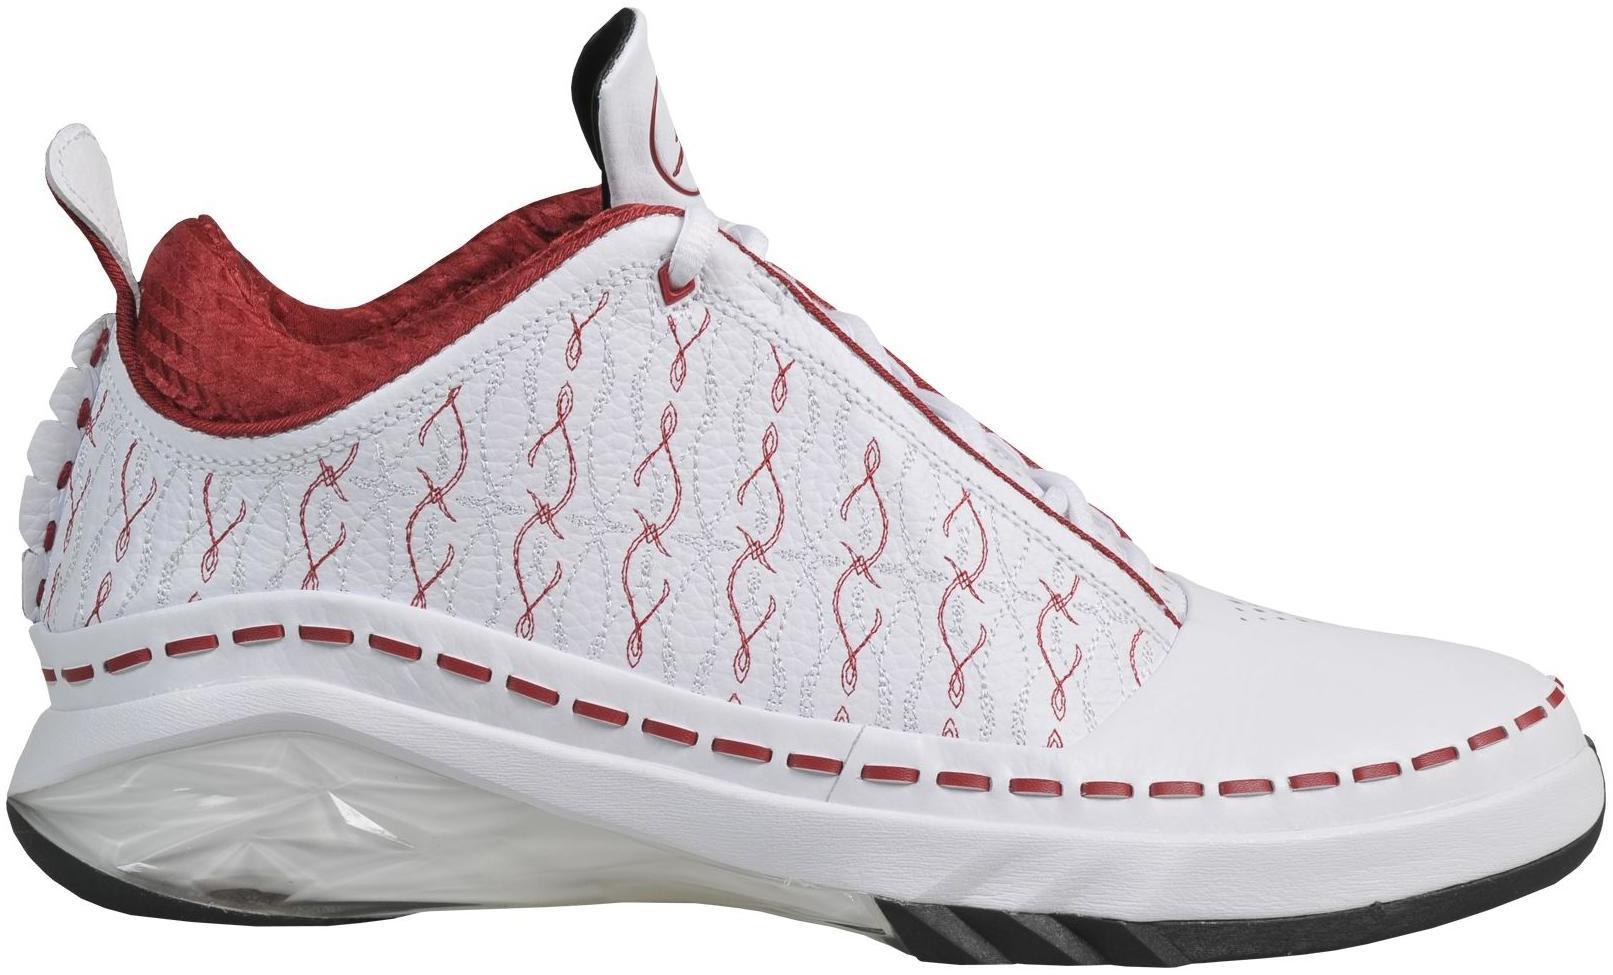 Jordan 23 Low White Varsity Red